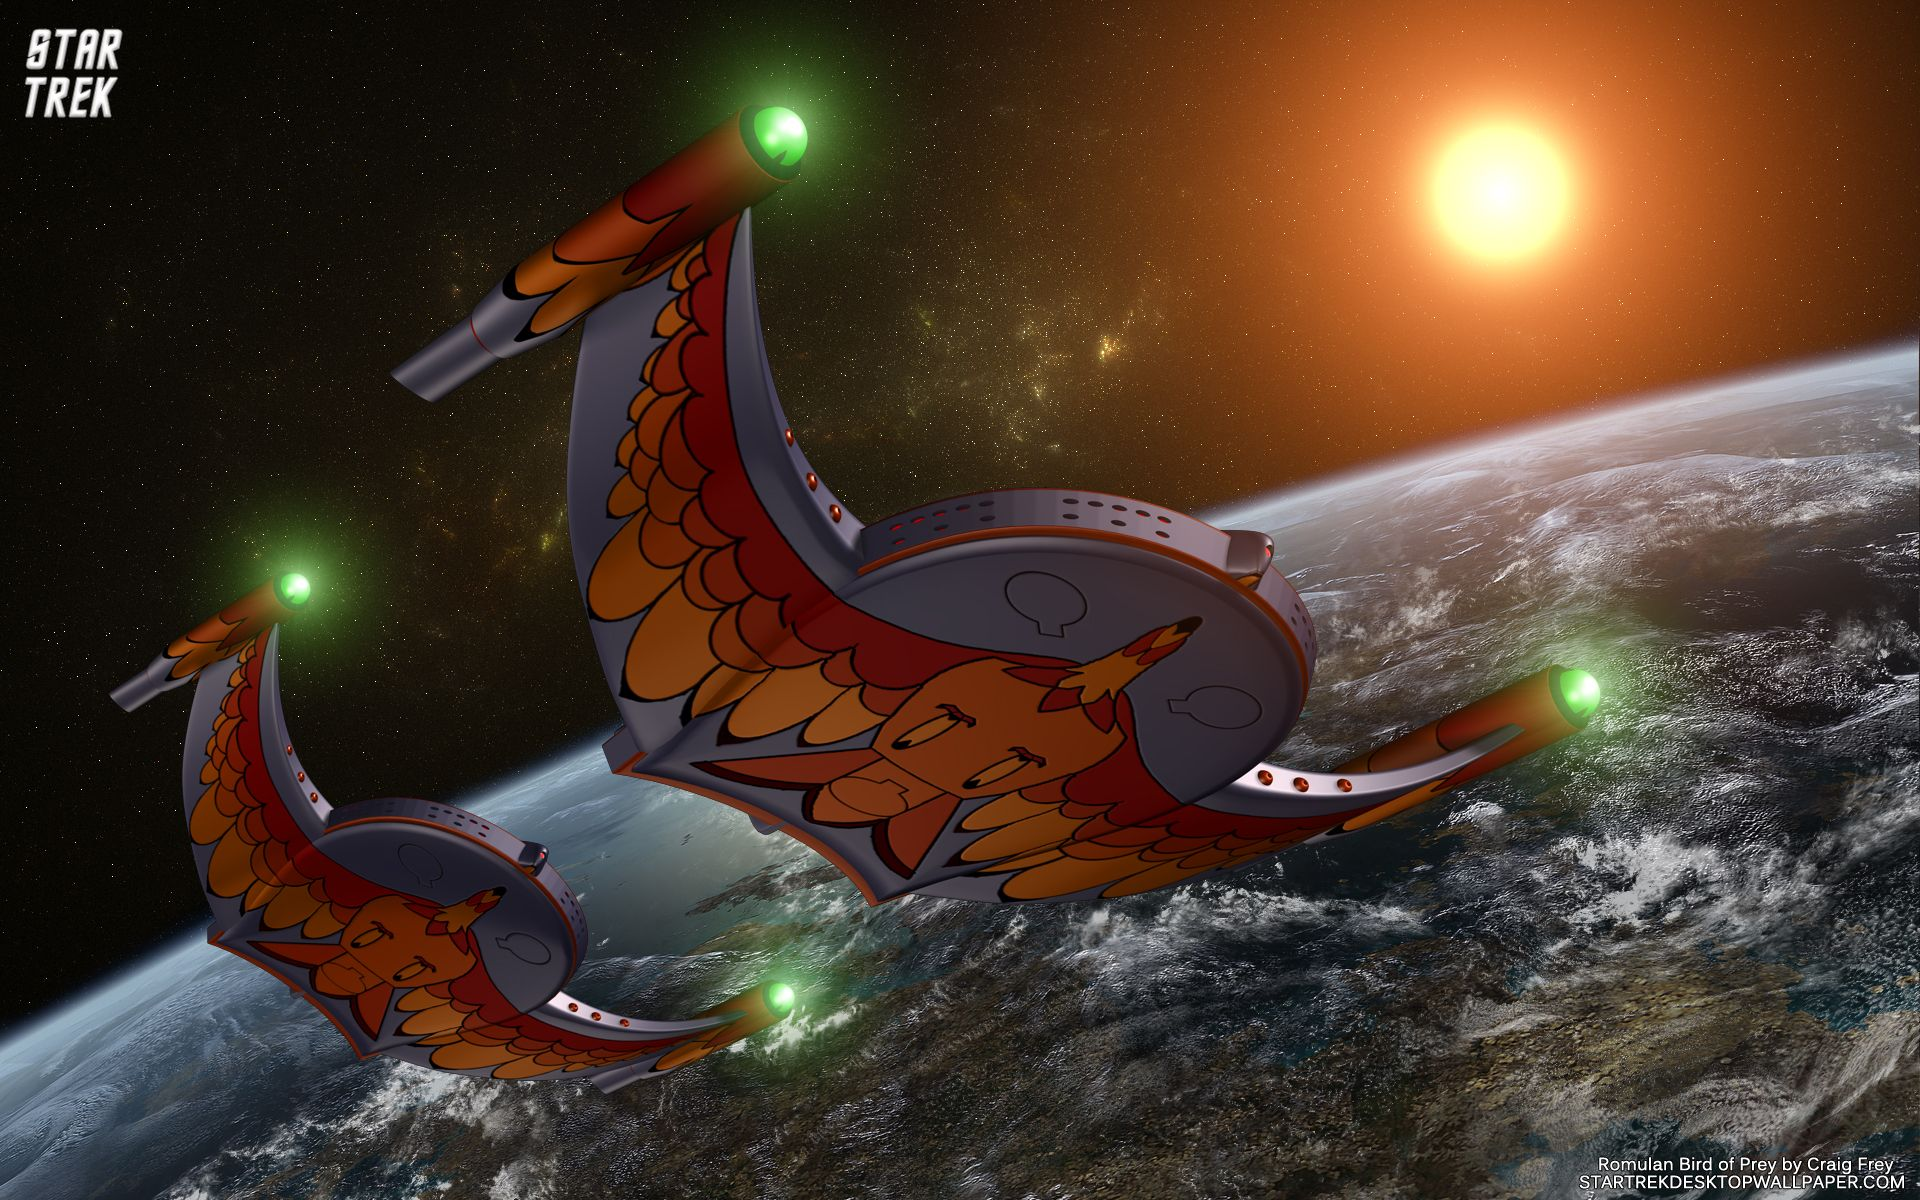 Star Trek Romulan Bird Of Prey Http I137photobucketcom Albums Qcircuitlowjpg